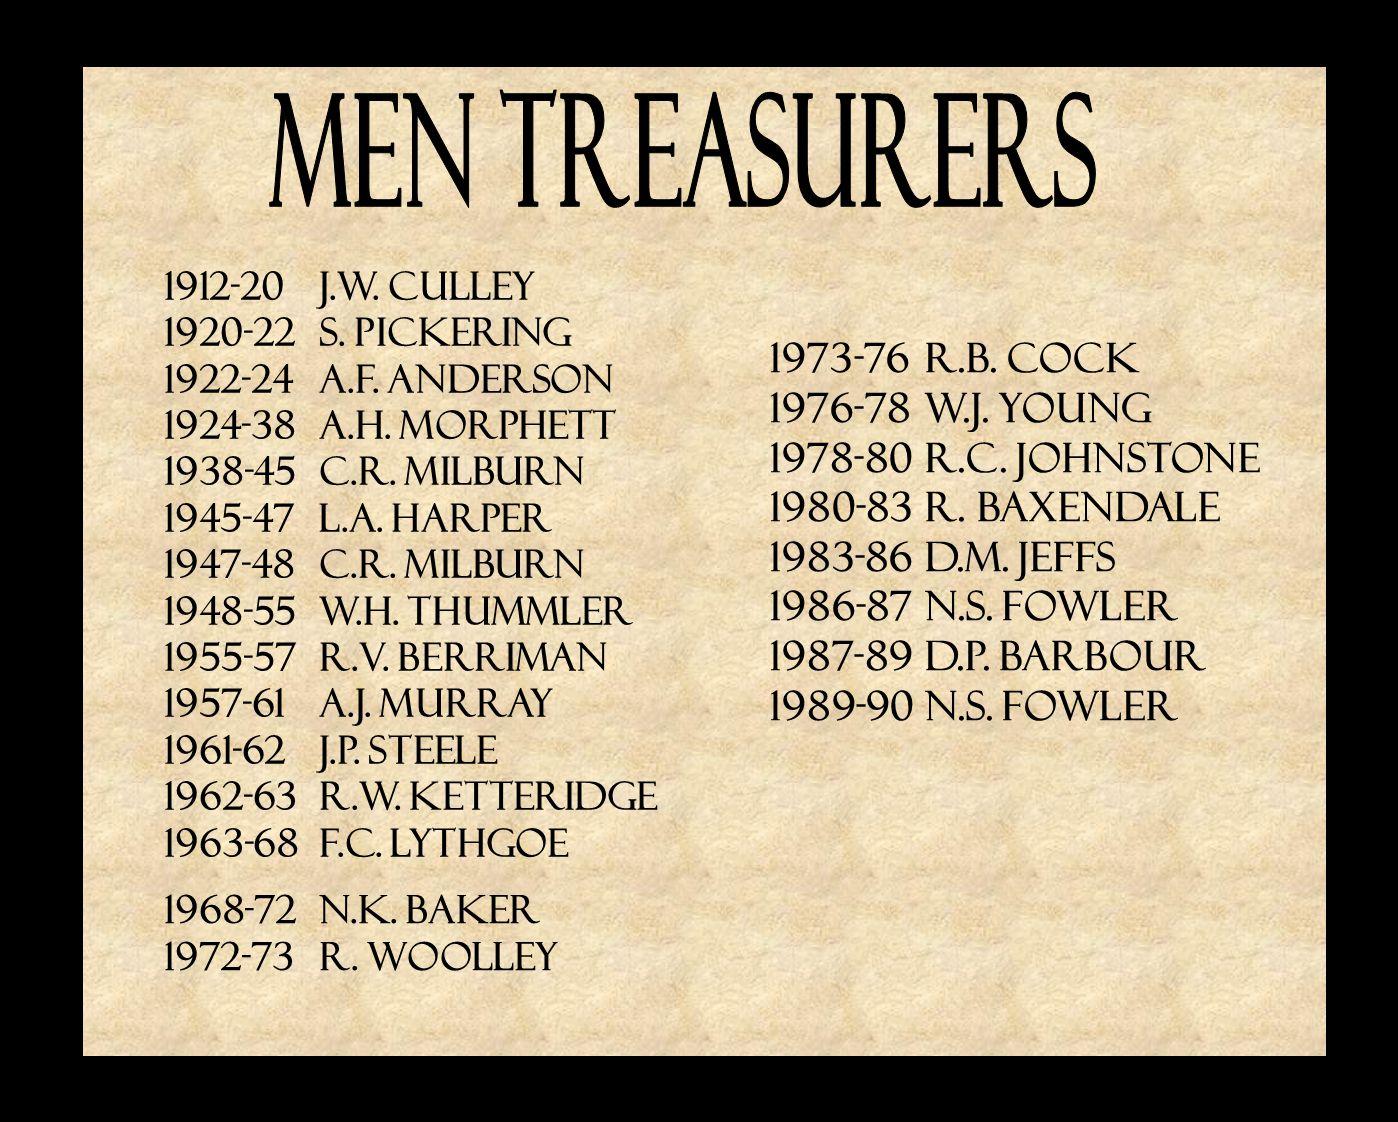 1912-20 J.W. CULLEY 1920-22 S. PICKERING 1922-24 A.F. ANDERSON 1924-38 A.H. MORPHETT 1938-45 C.R. MILBURN 1945-47 L.A. HARPER 1947-48 C.R. MILBURN 194